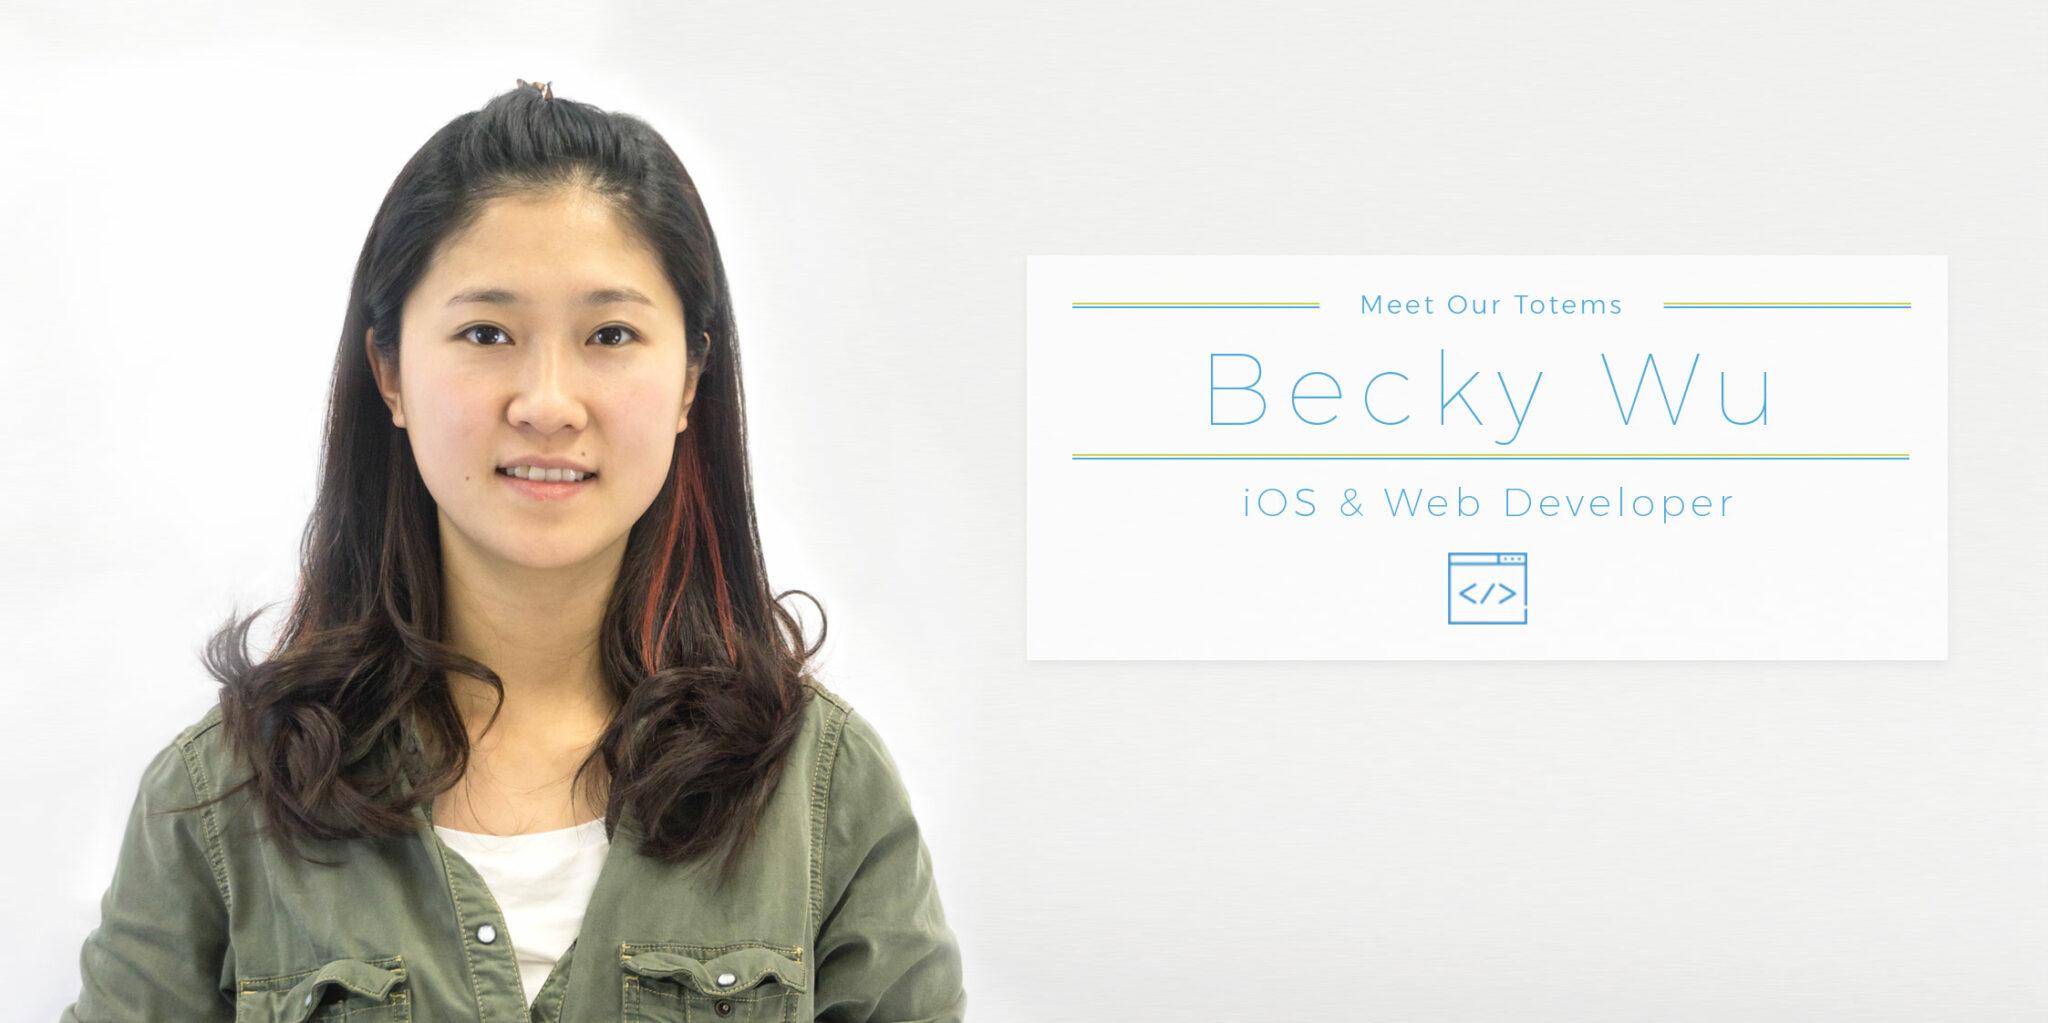 Meet our totems iOS & Web Developer Becky Wu